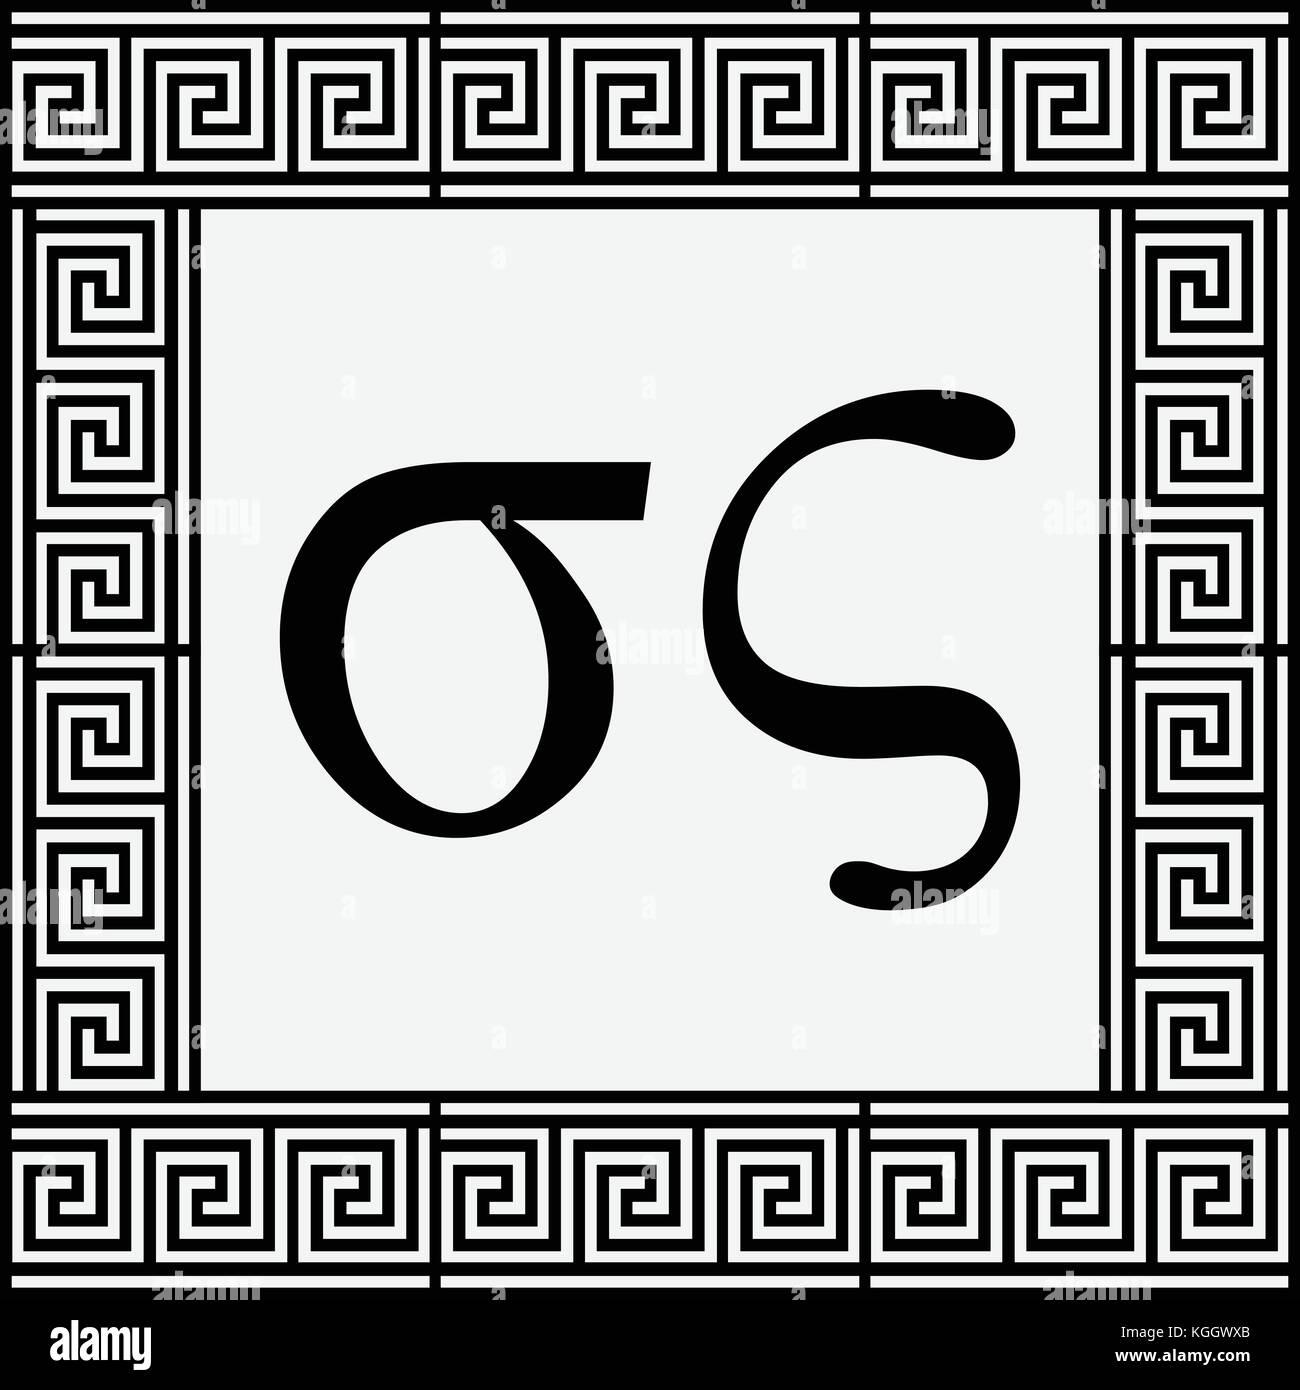 Math sigma symbol gallery symbol and sign ideas sigma symbol stock photos sigma symbol stock images alamy sigma greek small letters icon sigma symbols buycottarizona